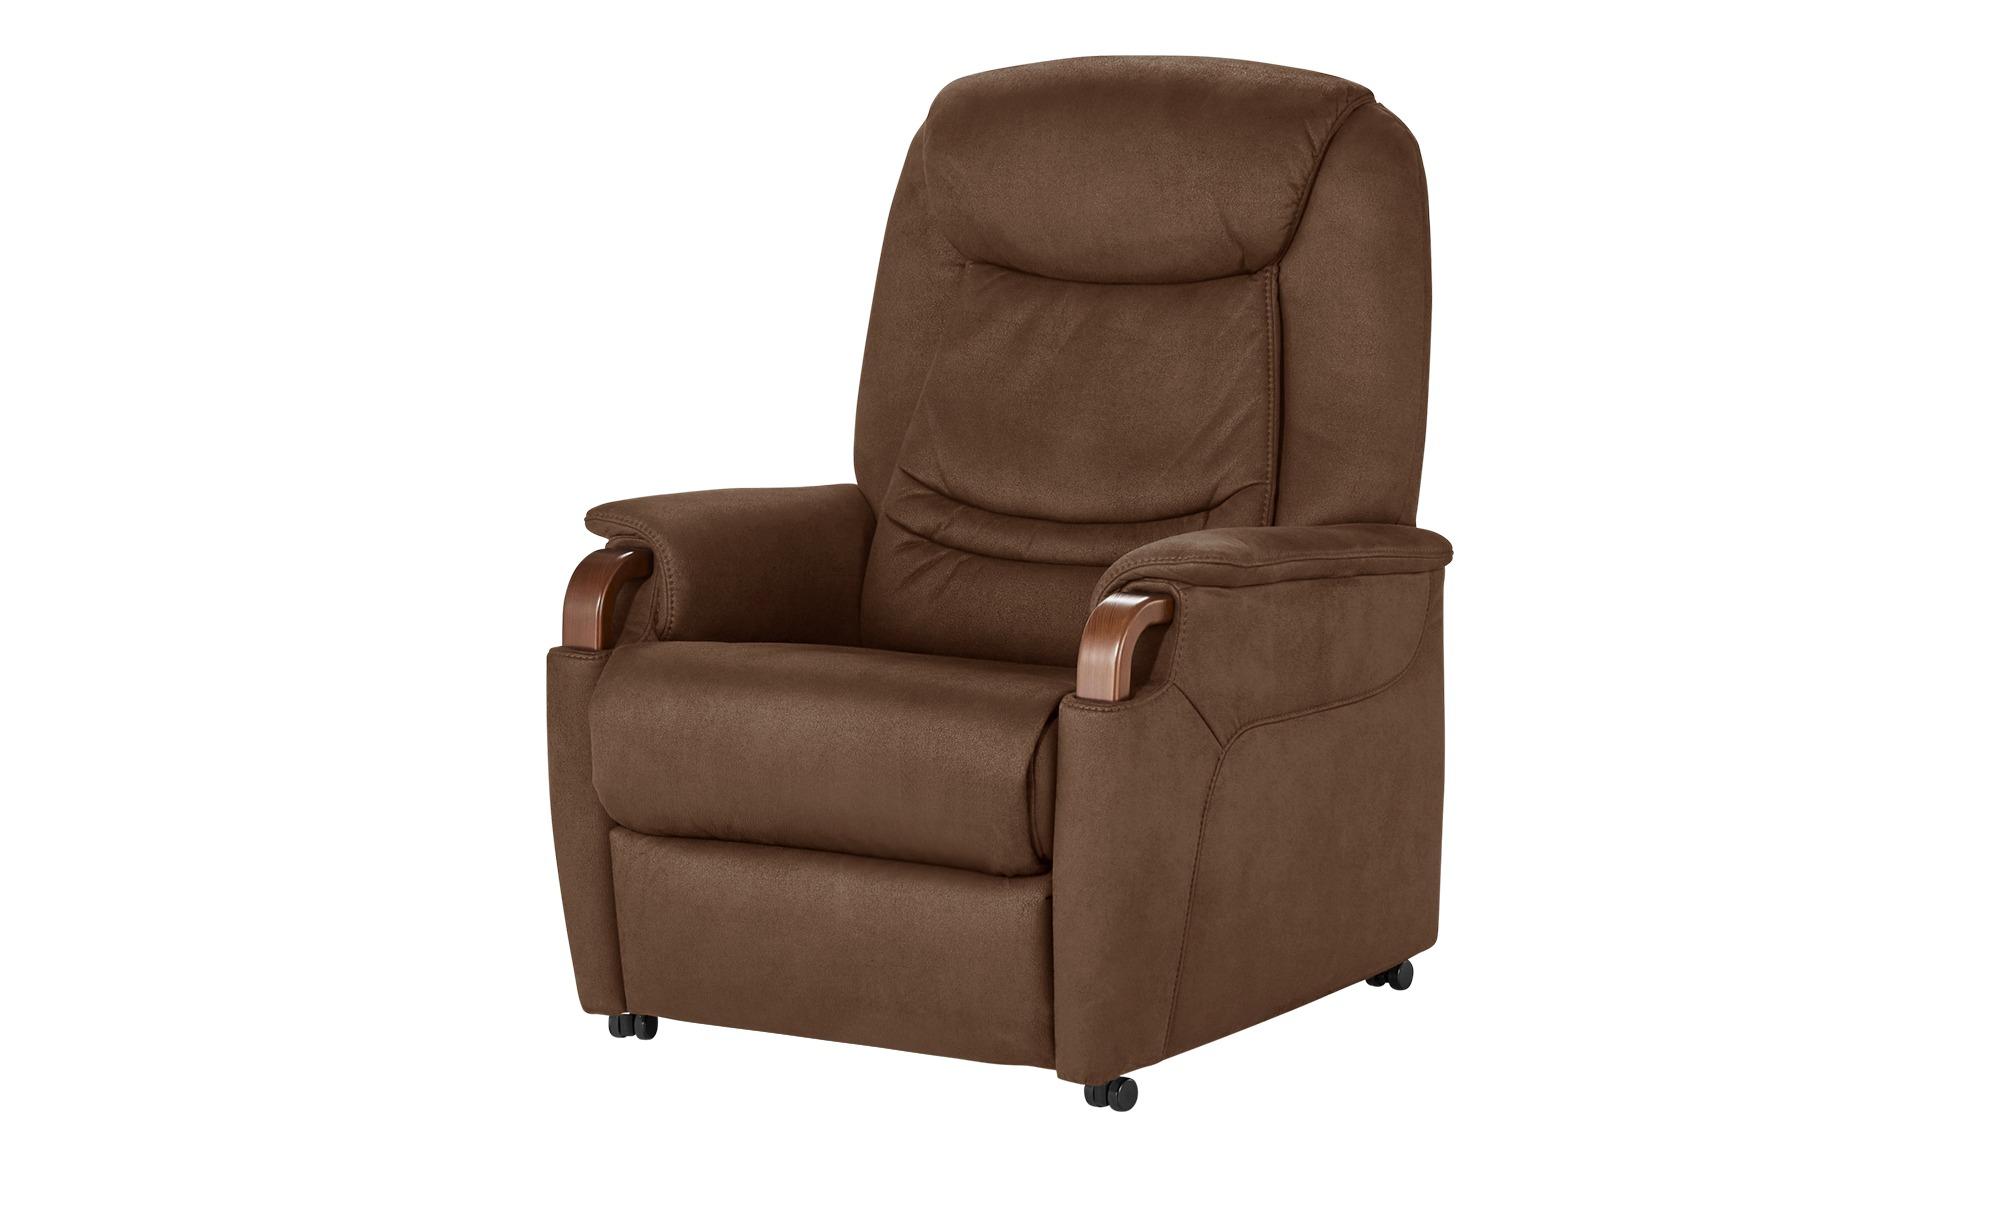 Hukla Relaxsessel  Jonas ¦ braun ¦ Maße (cm): B: 83 H: 106 T: 82 Polstermöbel > Sessel > Fernsehsessel - Höffner